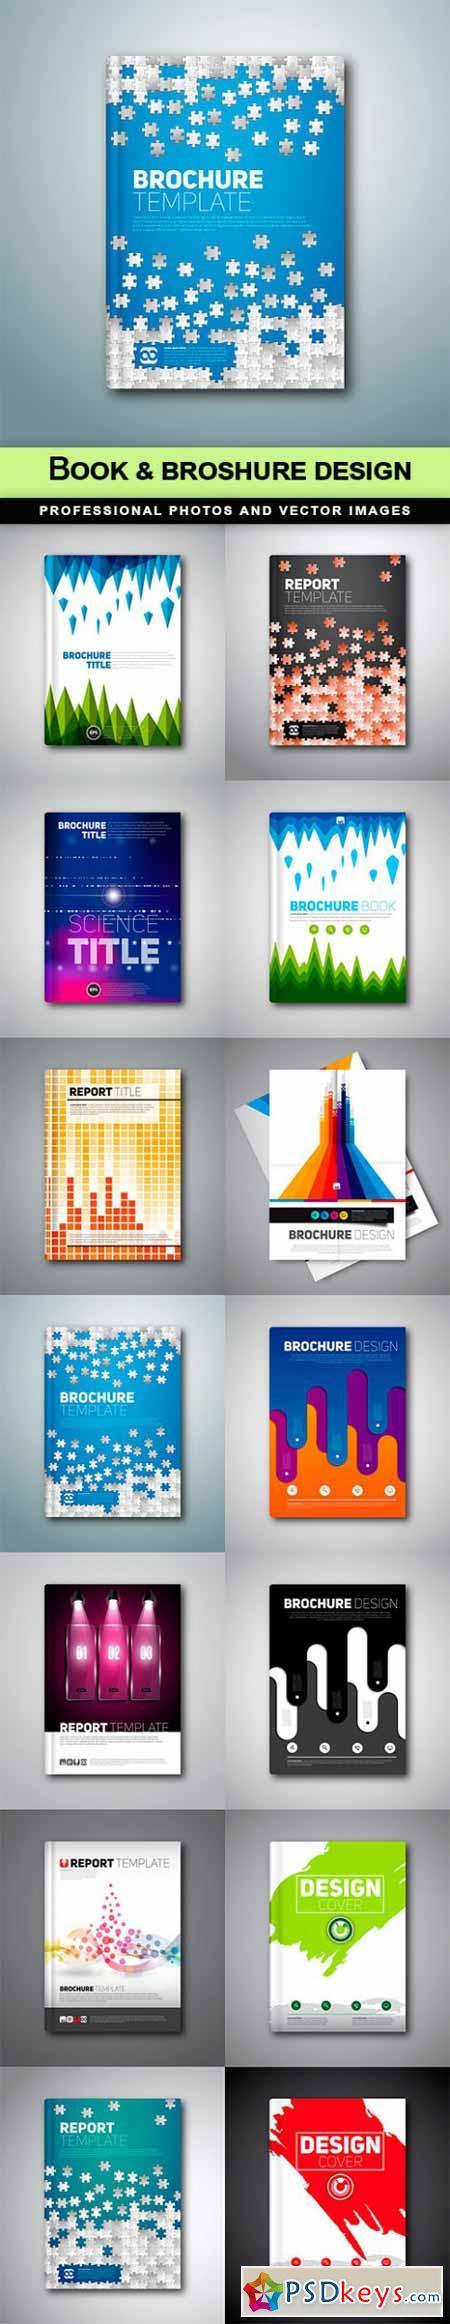 Book & broshure design - 14 EPS